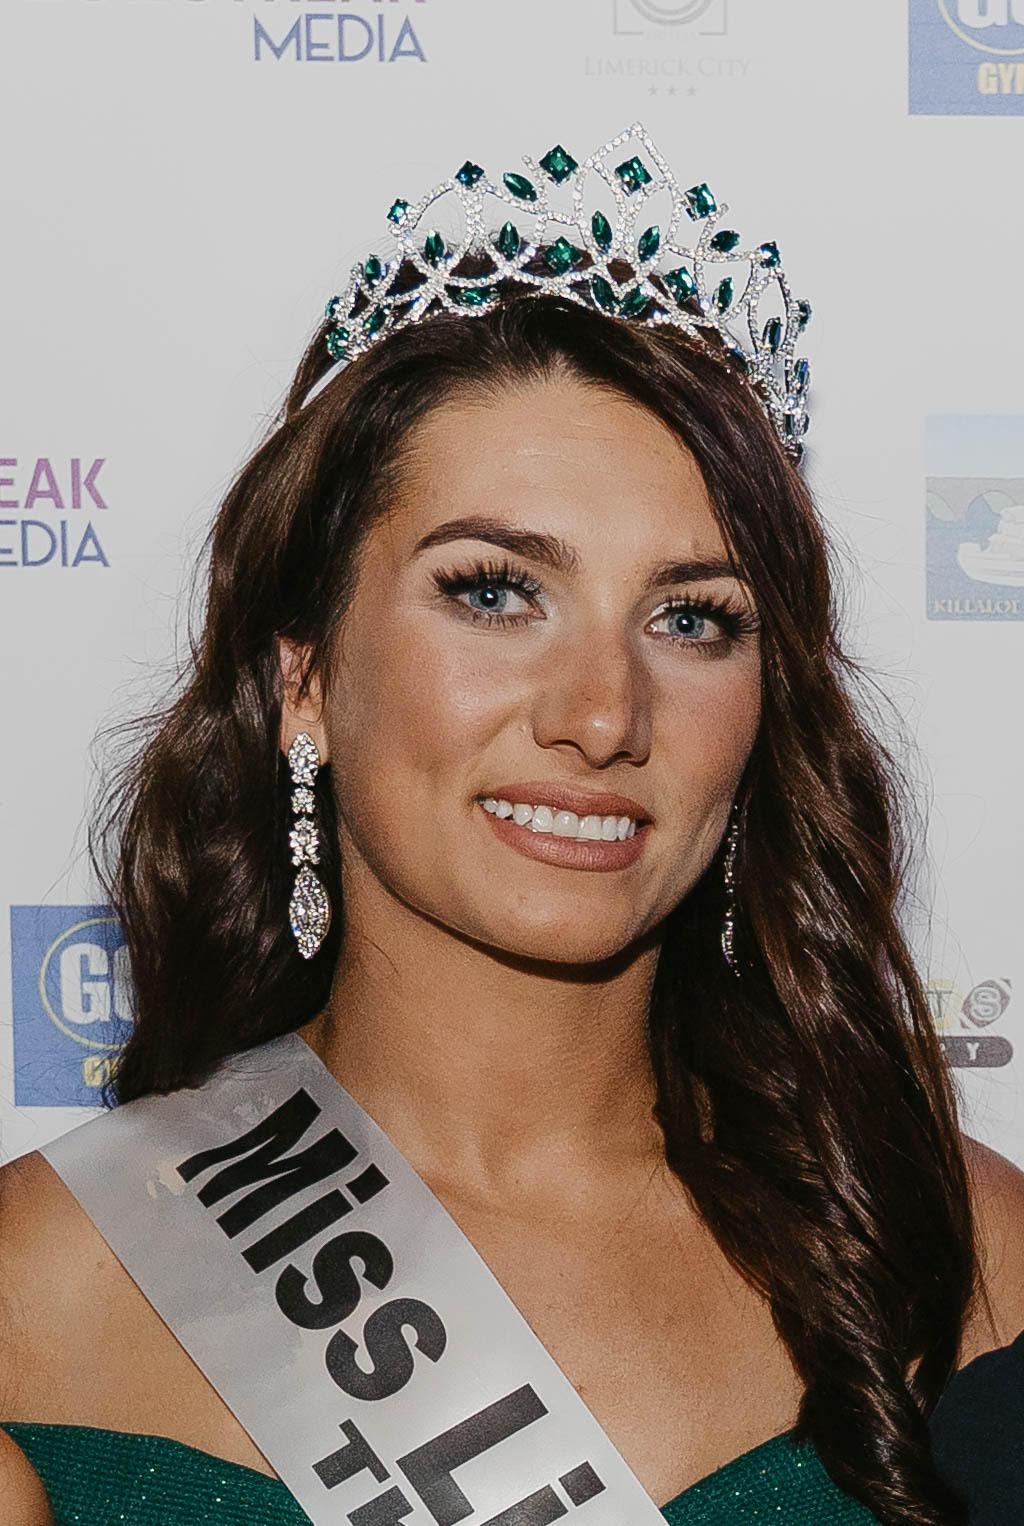 Miss Limerick 2019 Ciara O'Halloran